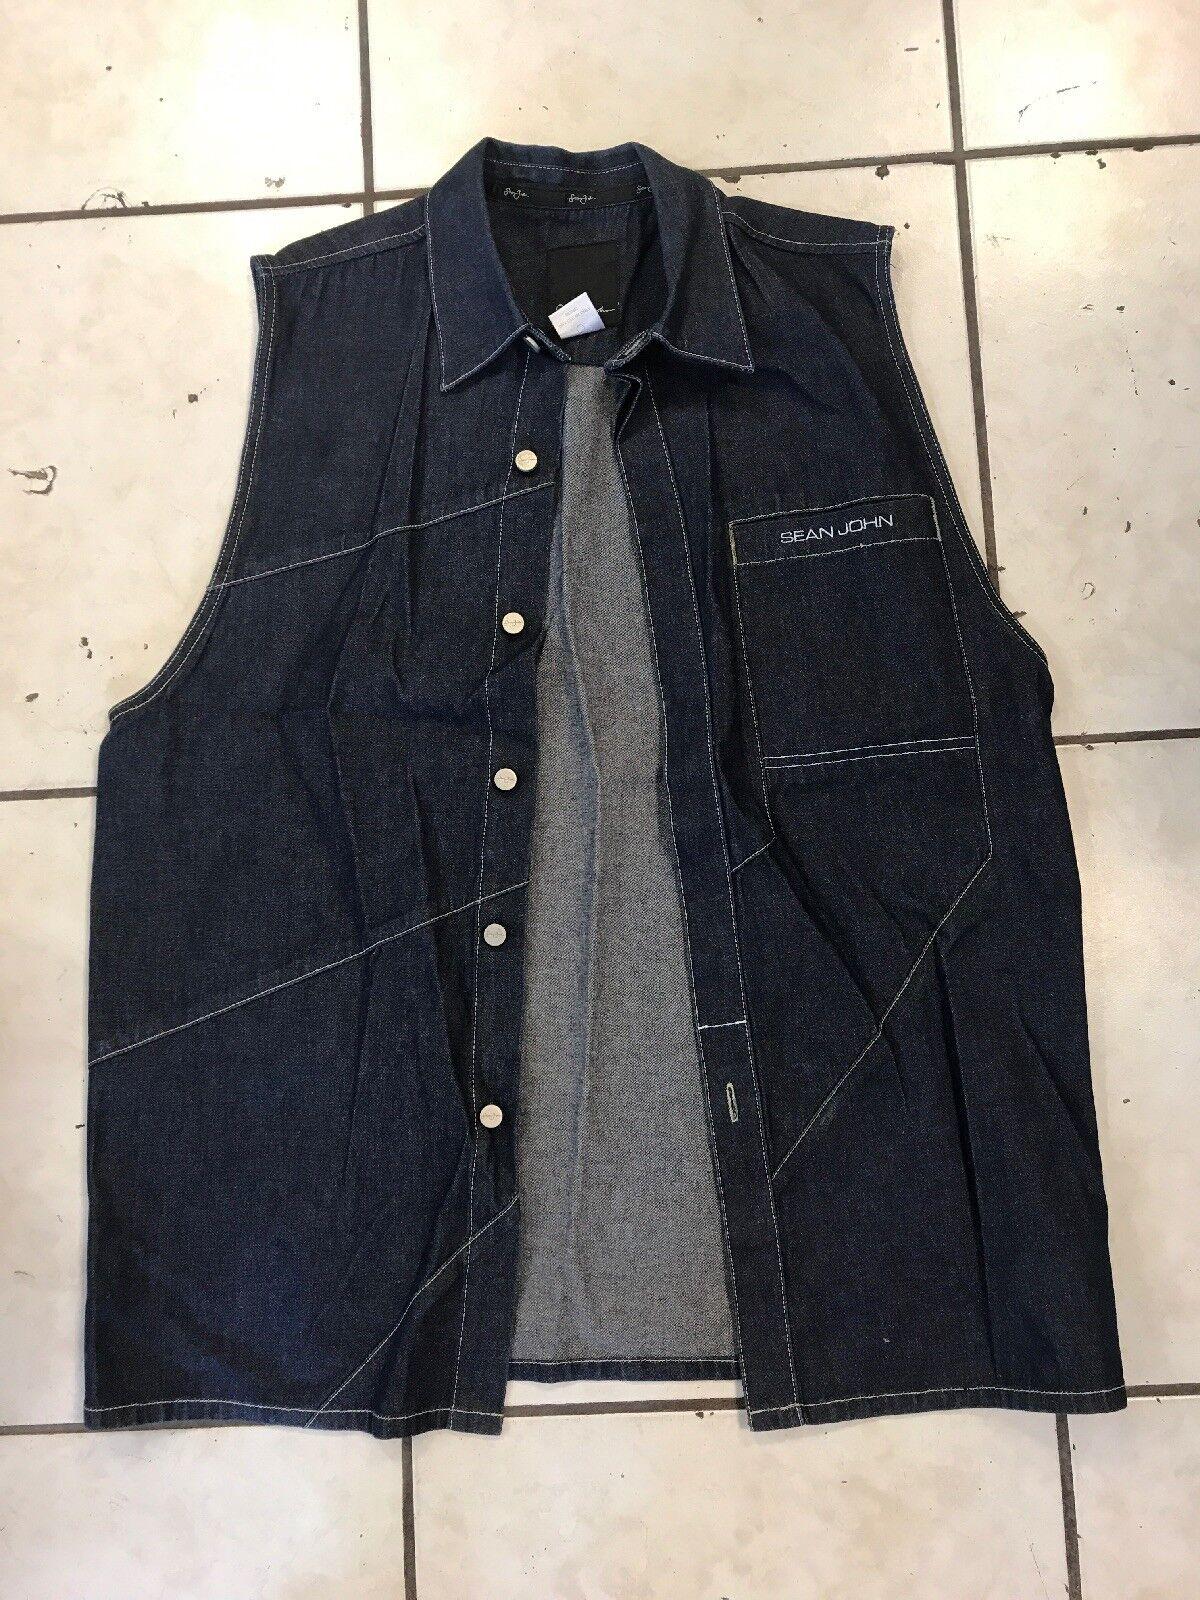 Sean John Men's bluee Denim Jean Vest Size Large